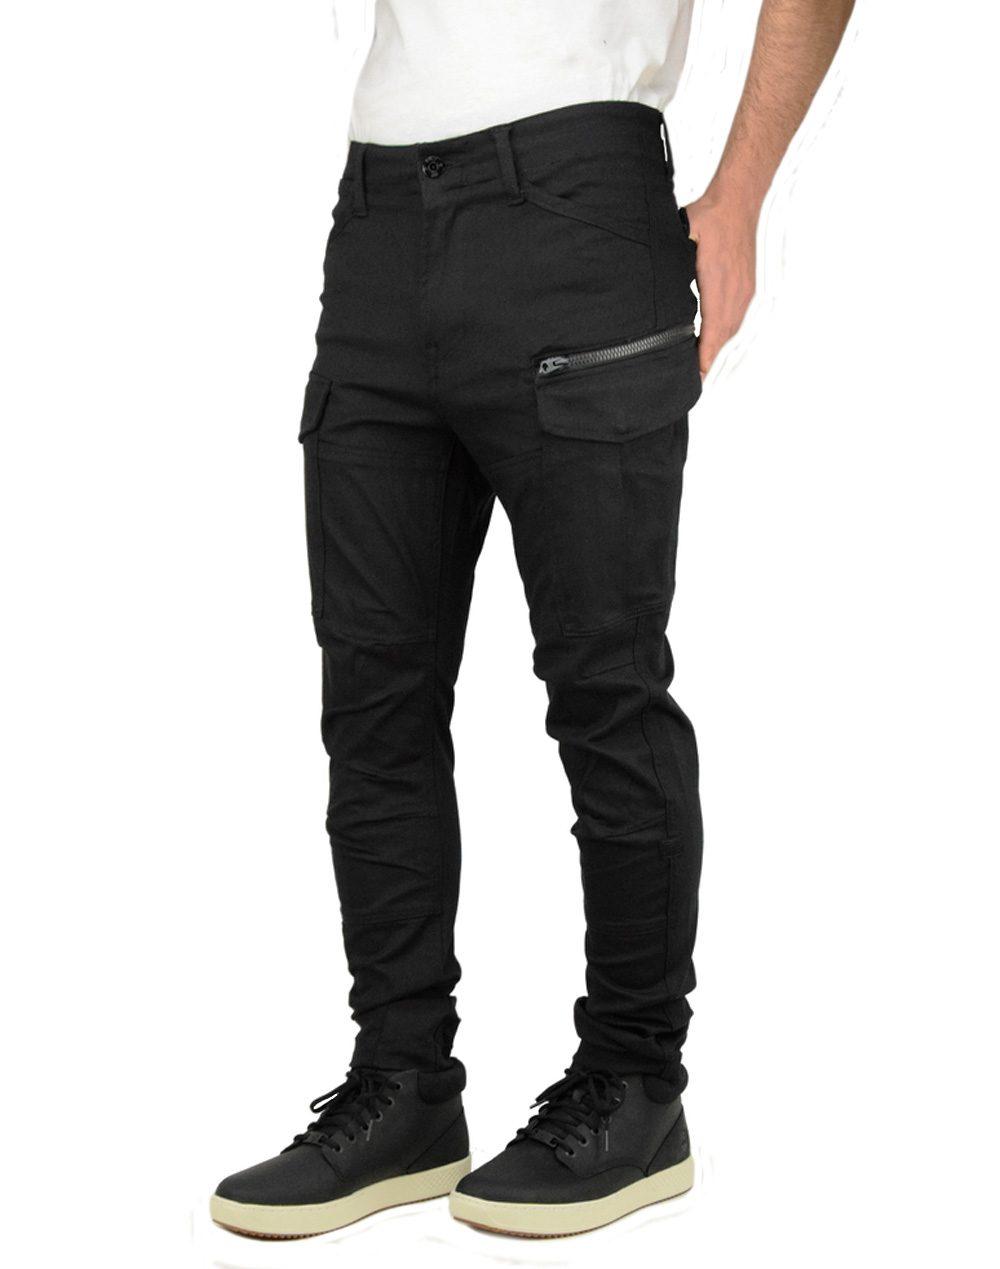 G-Star Raw Rovic Zip 3D Skinny Black (D11062-8970-001)